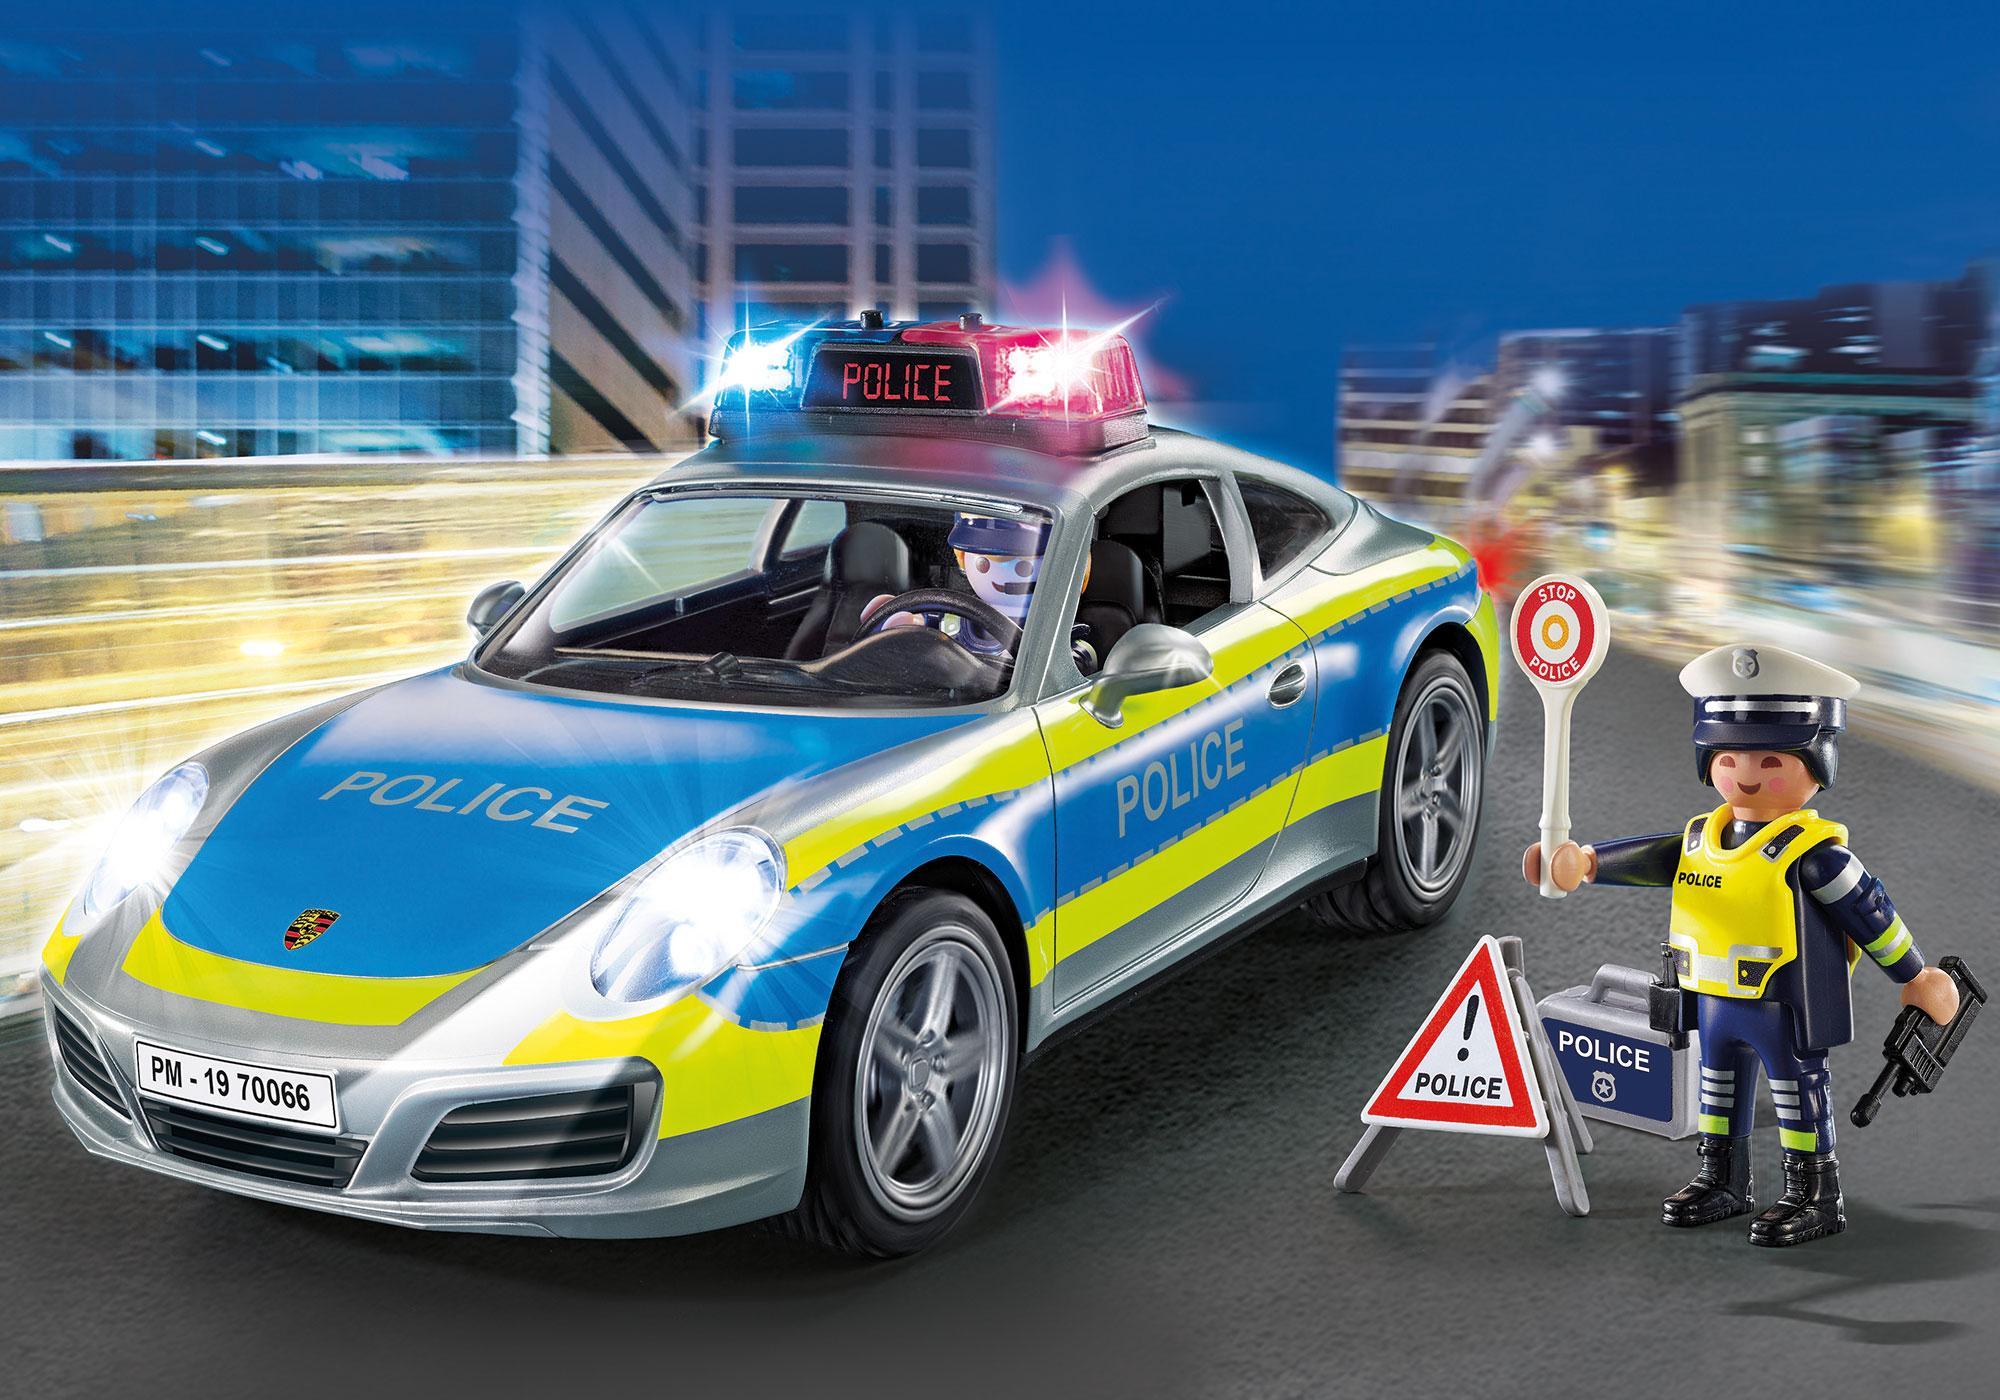 http://media.playmobil.com/i/playmobil/70066_product_detail/Porsche 911 Carrera 4S Police